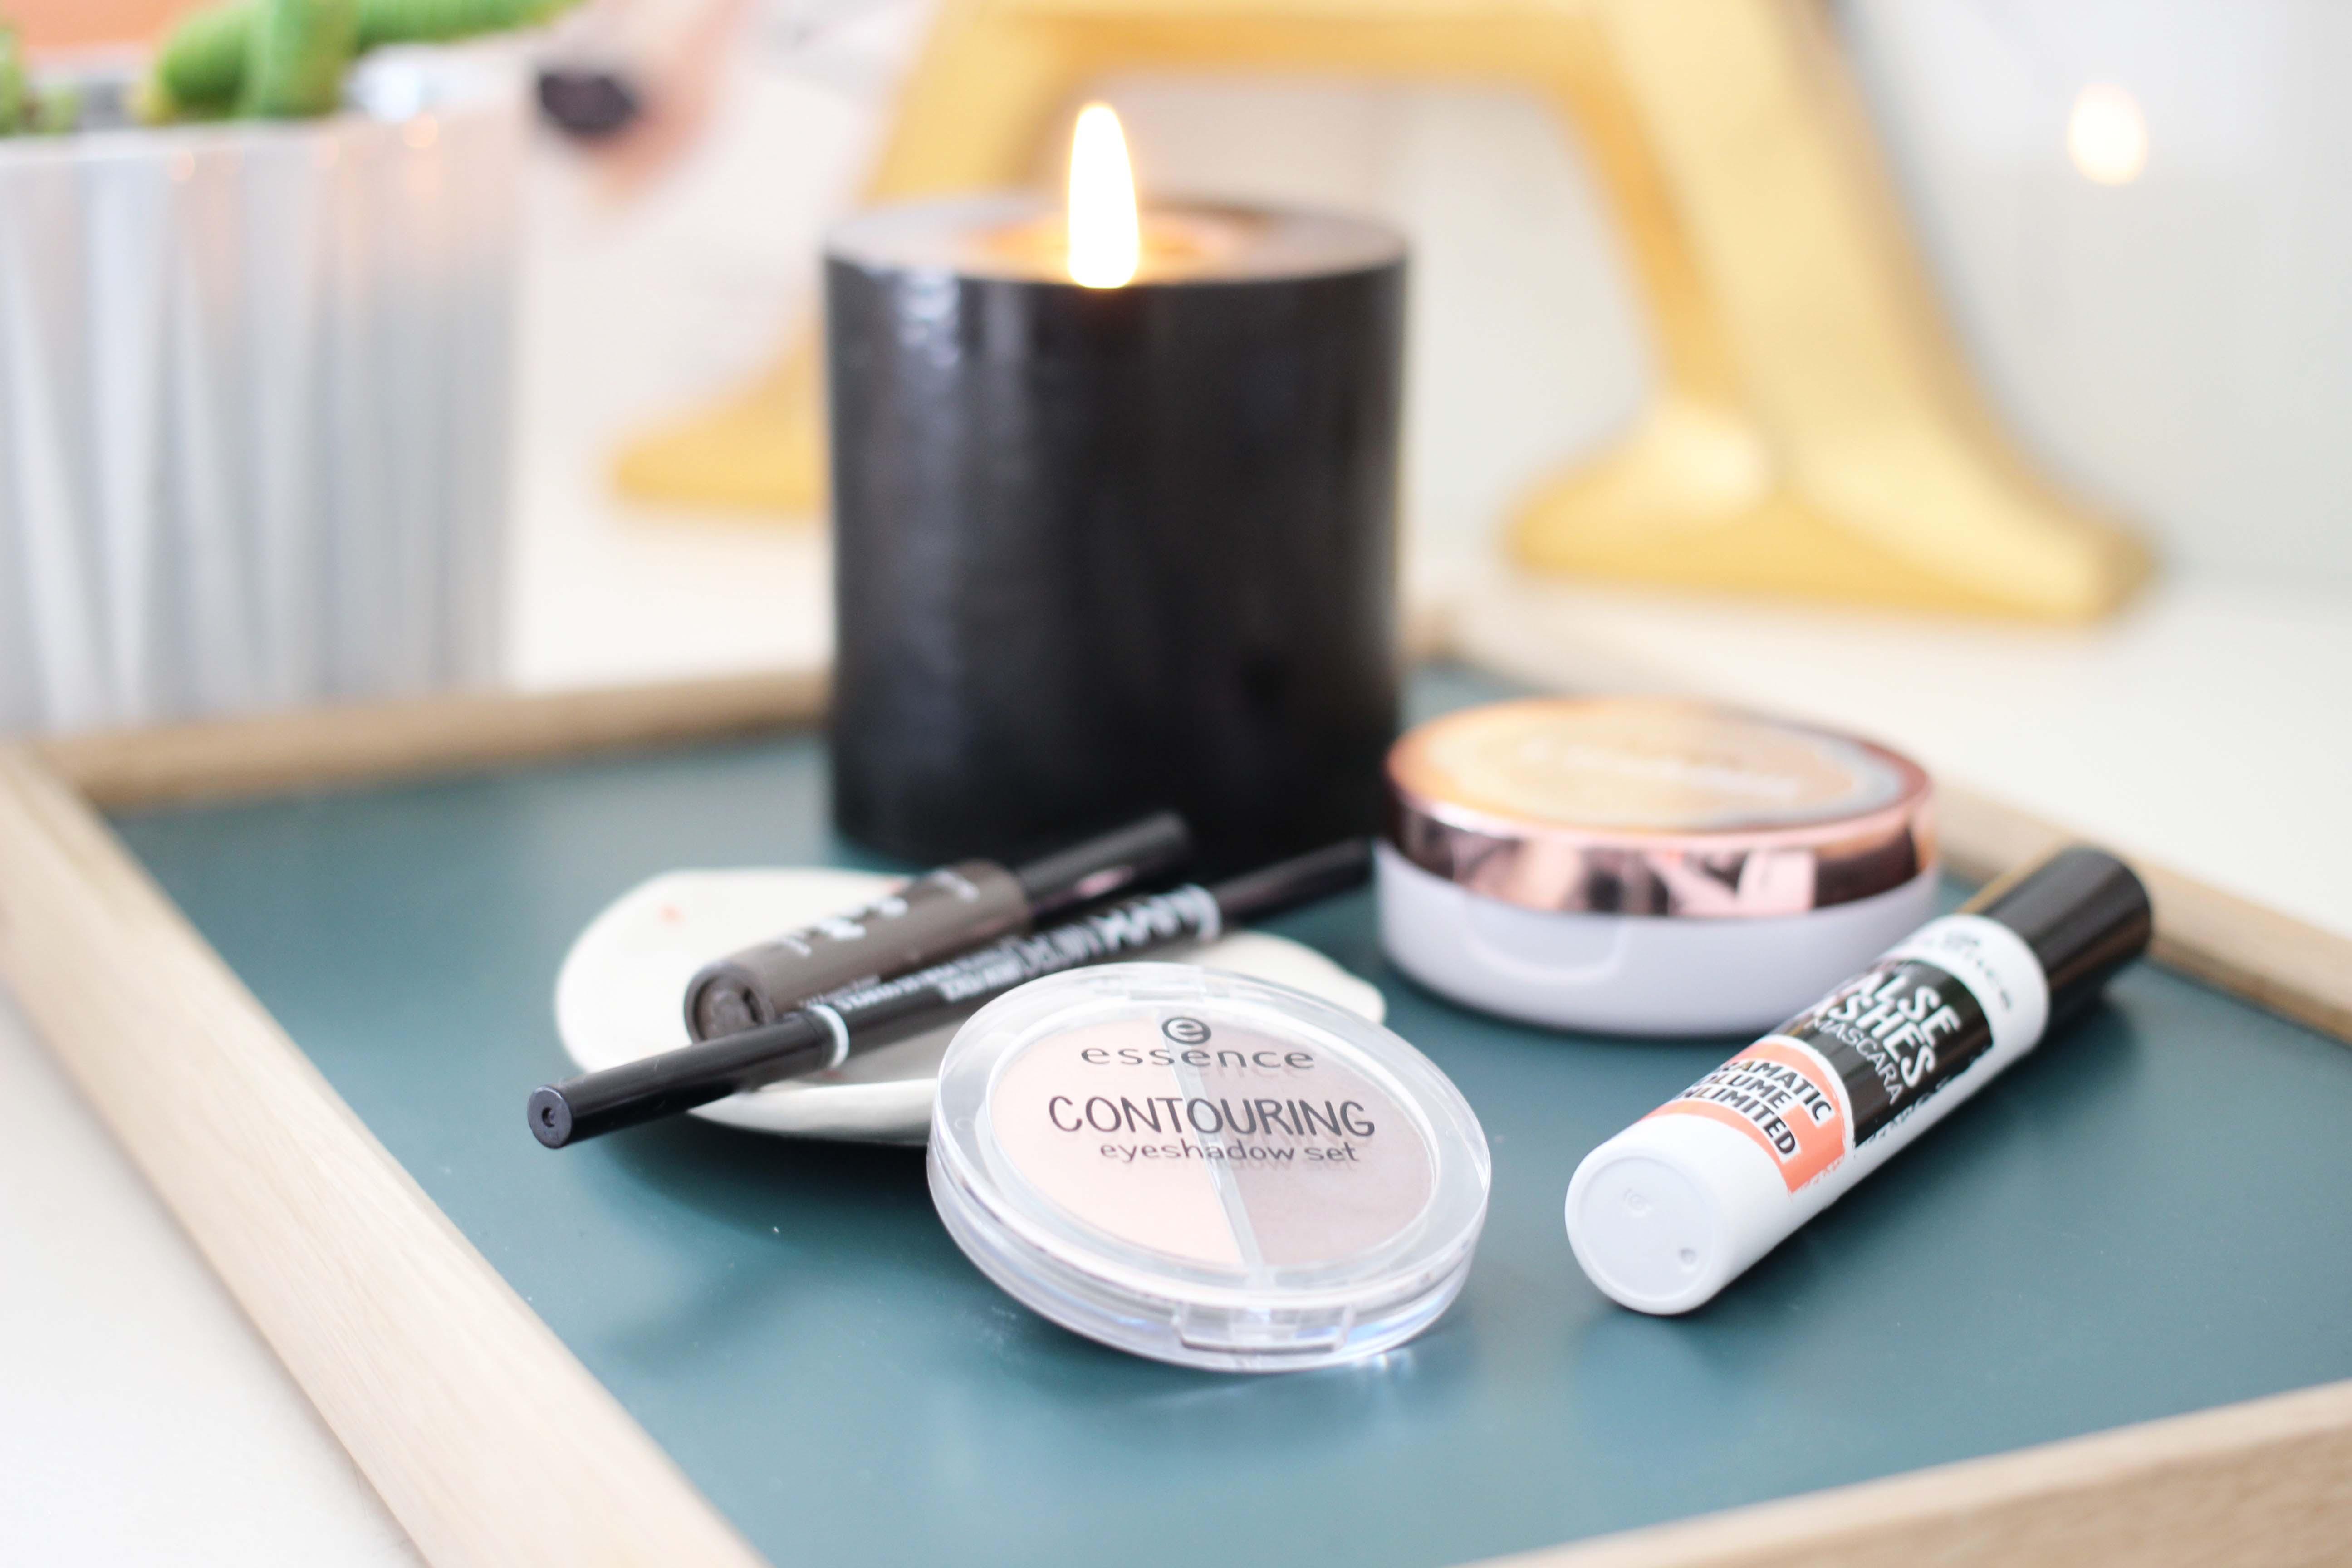 essence countering eyeshadows